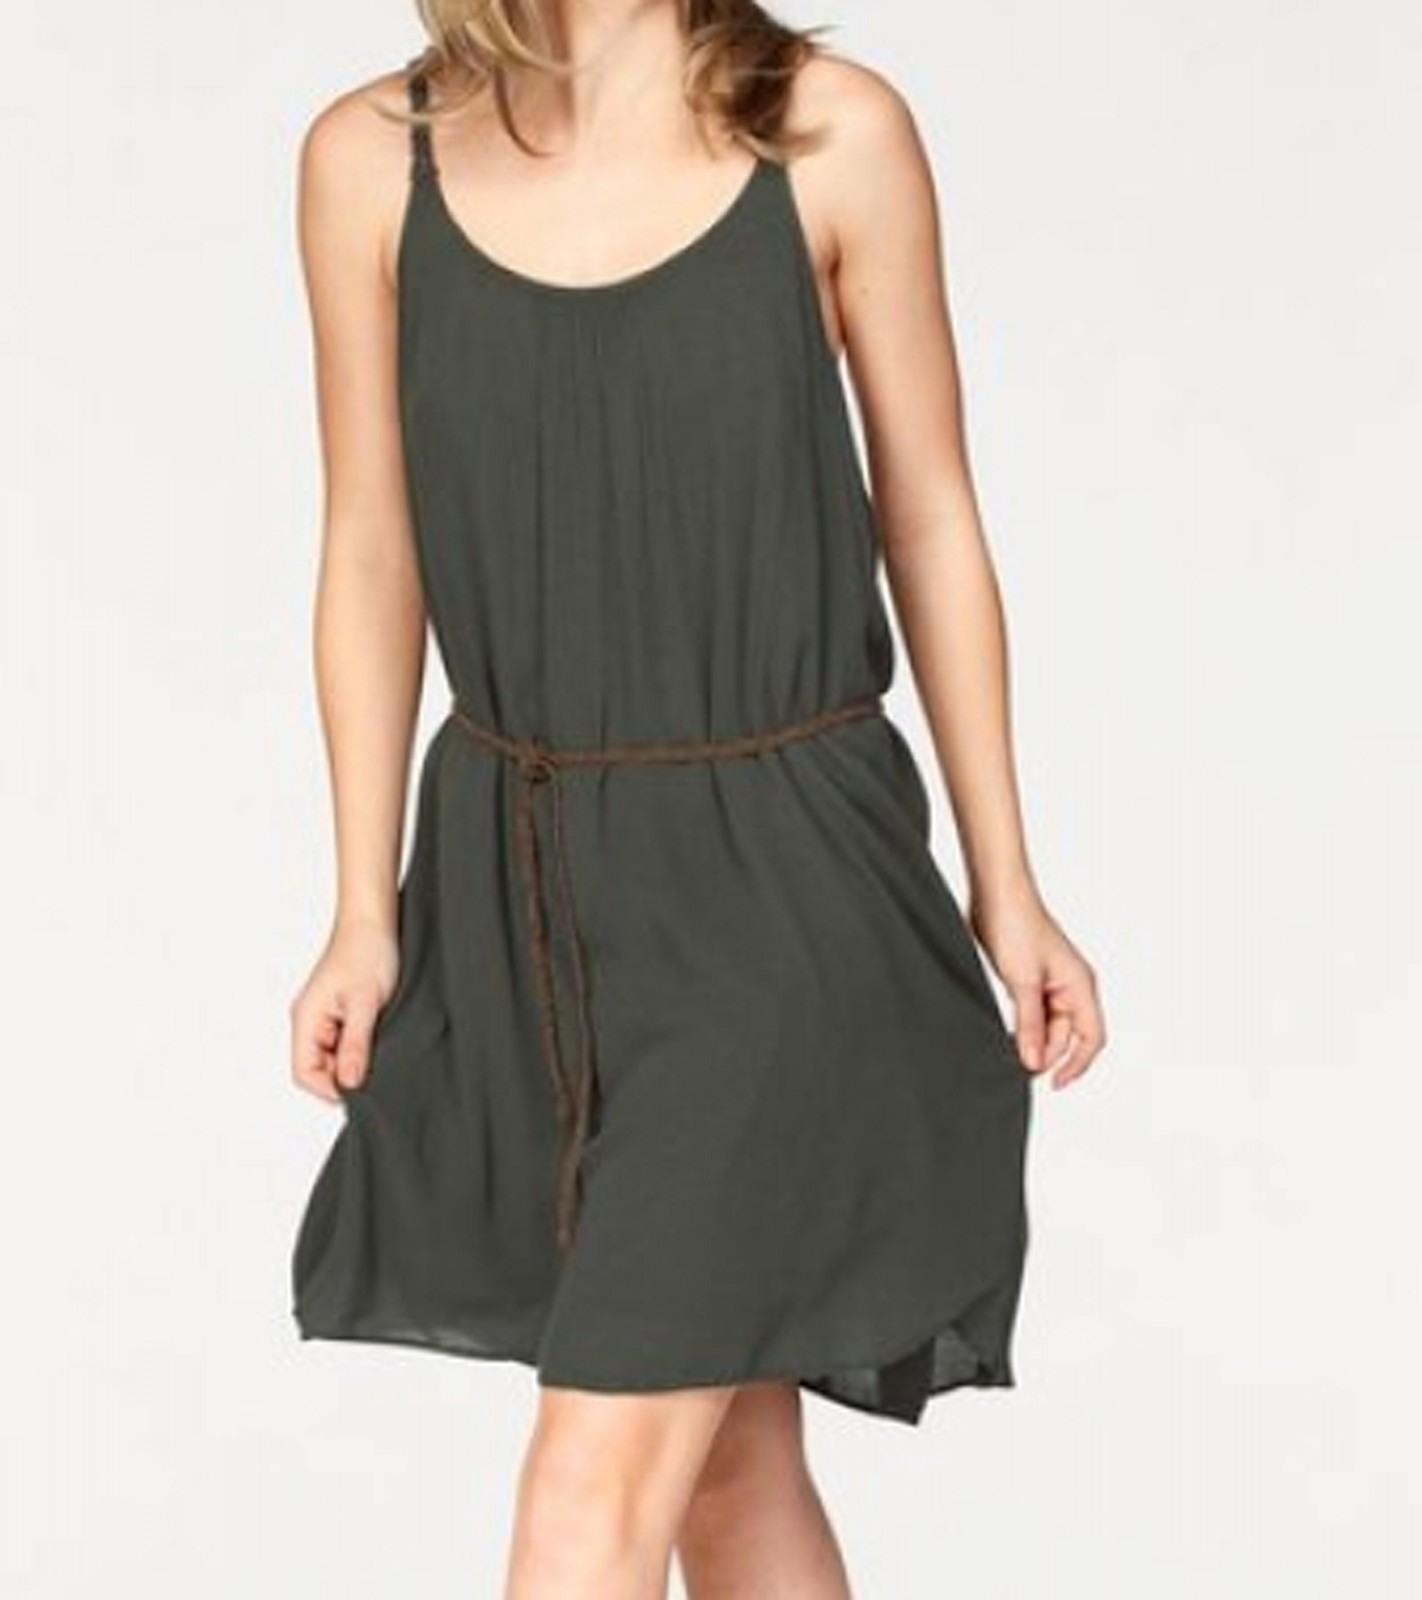 Formal Coolste Kleid Olivgrün Spezialgebiet  Abendkleid